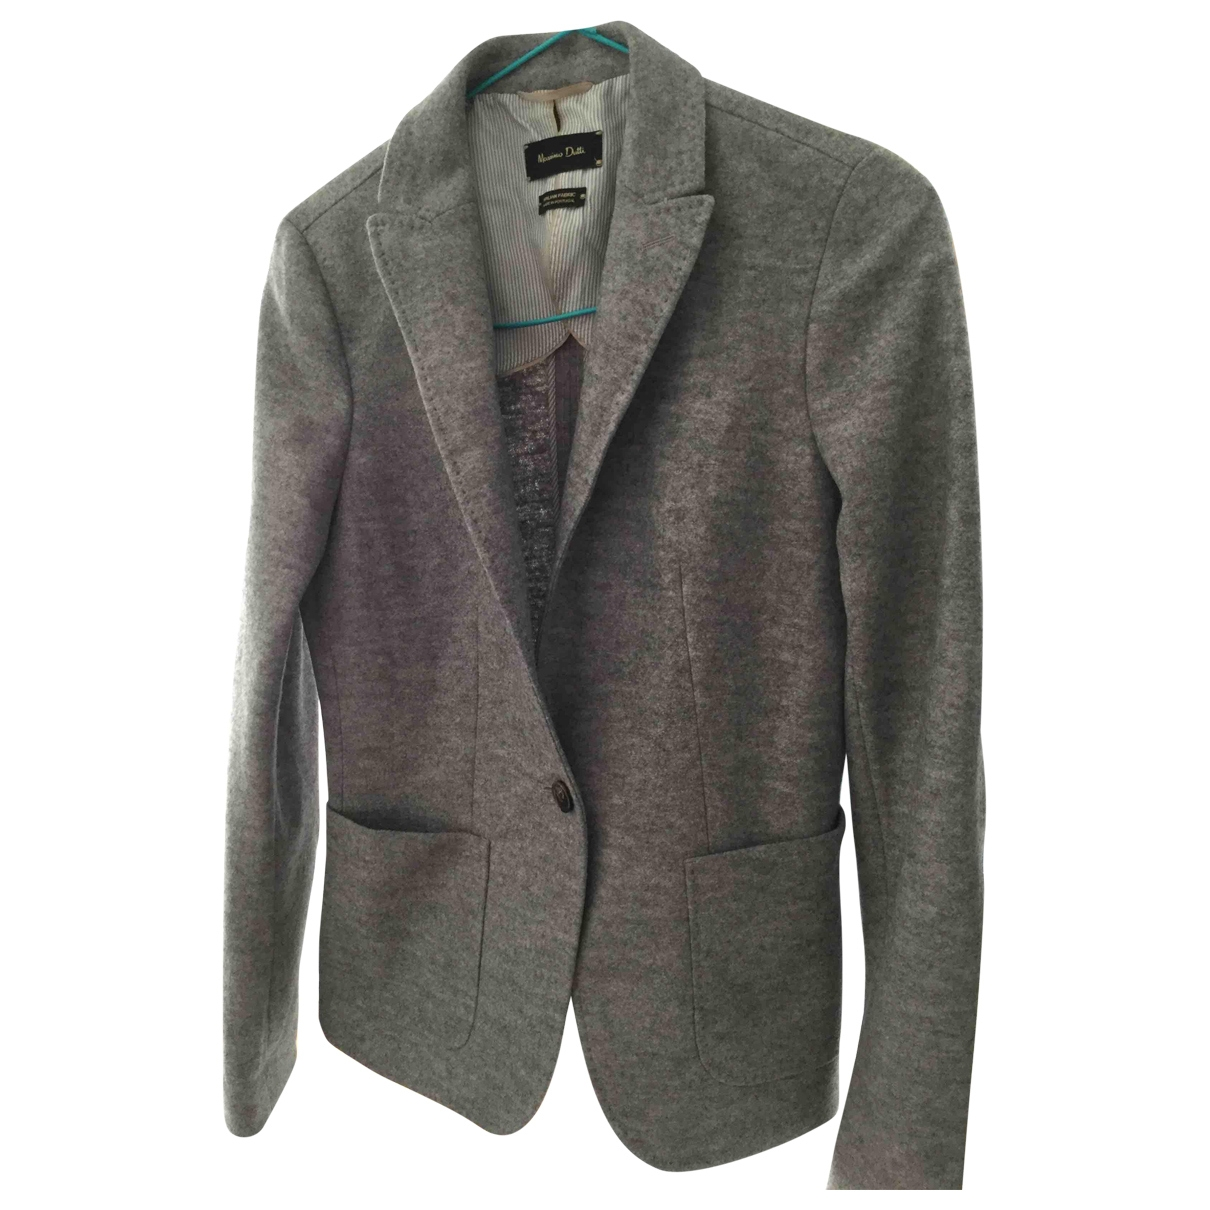 Massimo Dutti \N Jacke in  Grau Wolle